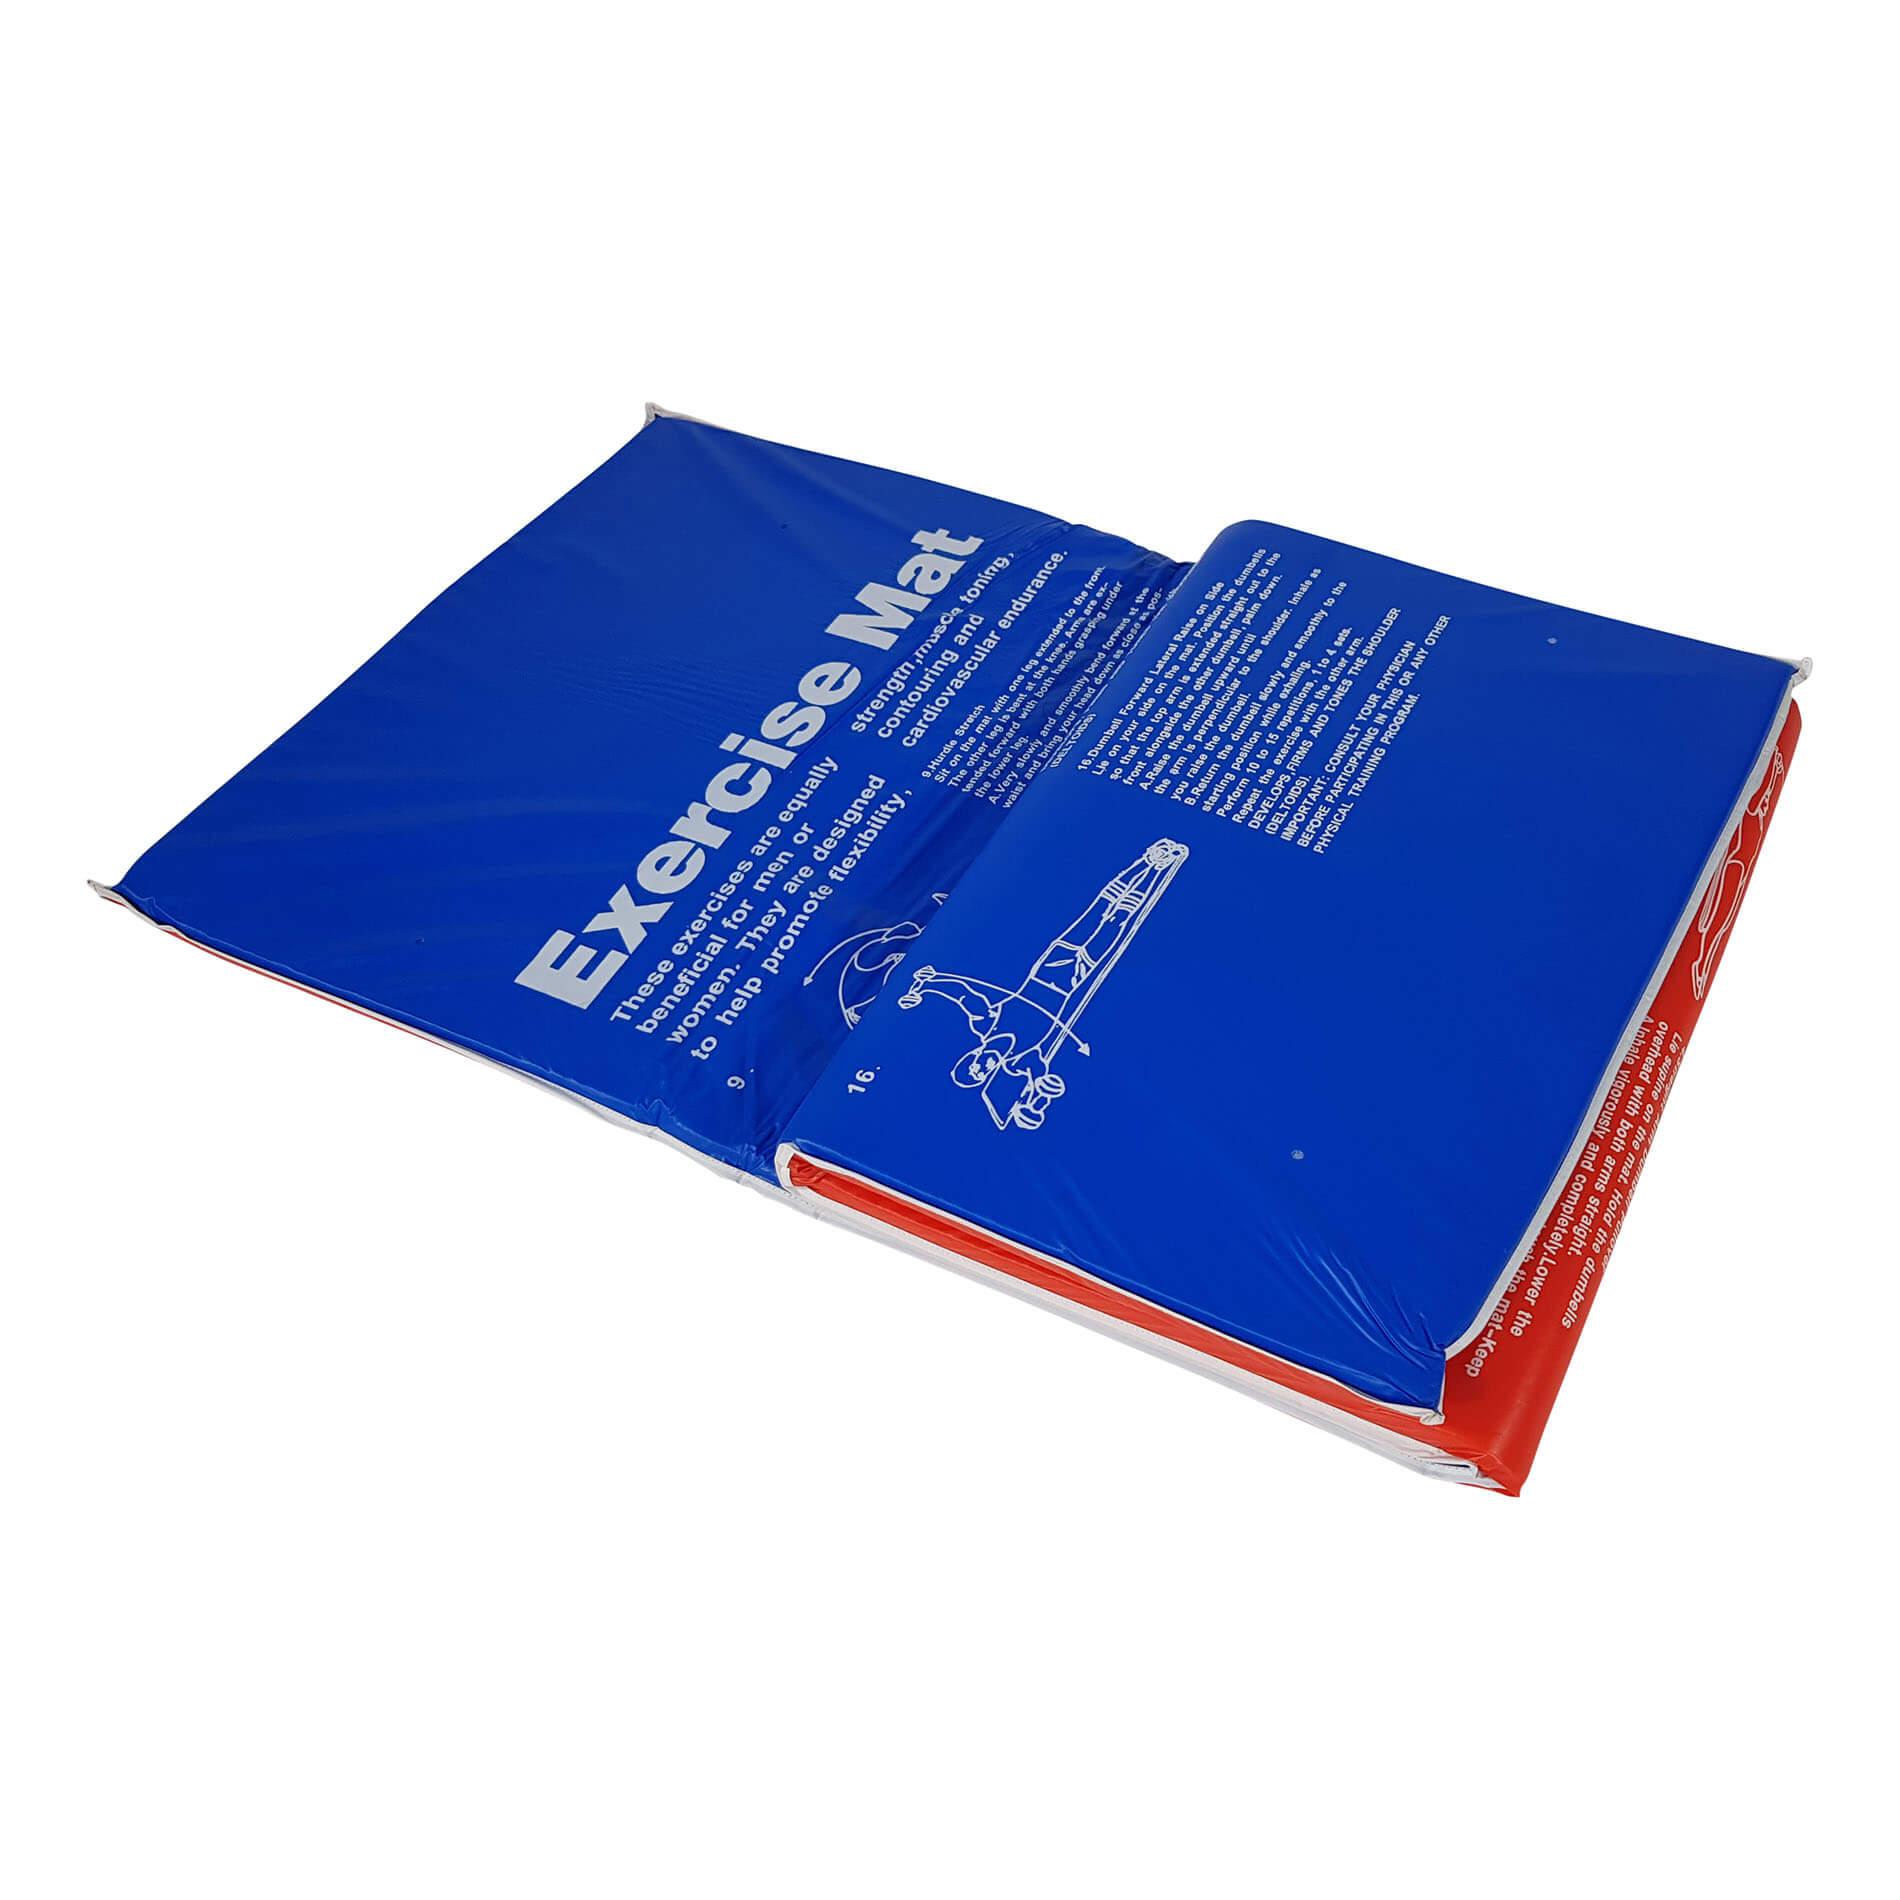 Aerobic mat - Fitnessmat - Oefenmat - 180 cm x 60 cm x 2,5 cm - Rood/Blauw